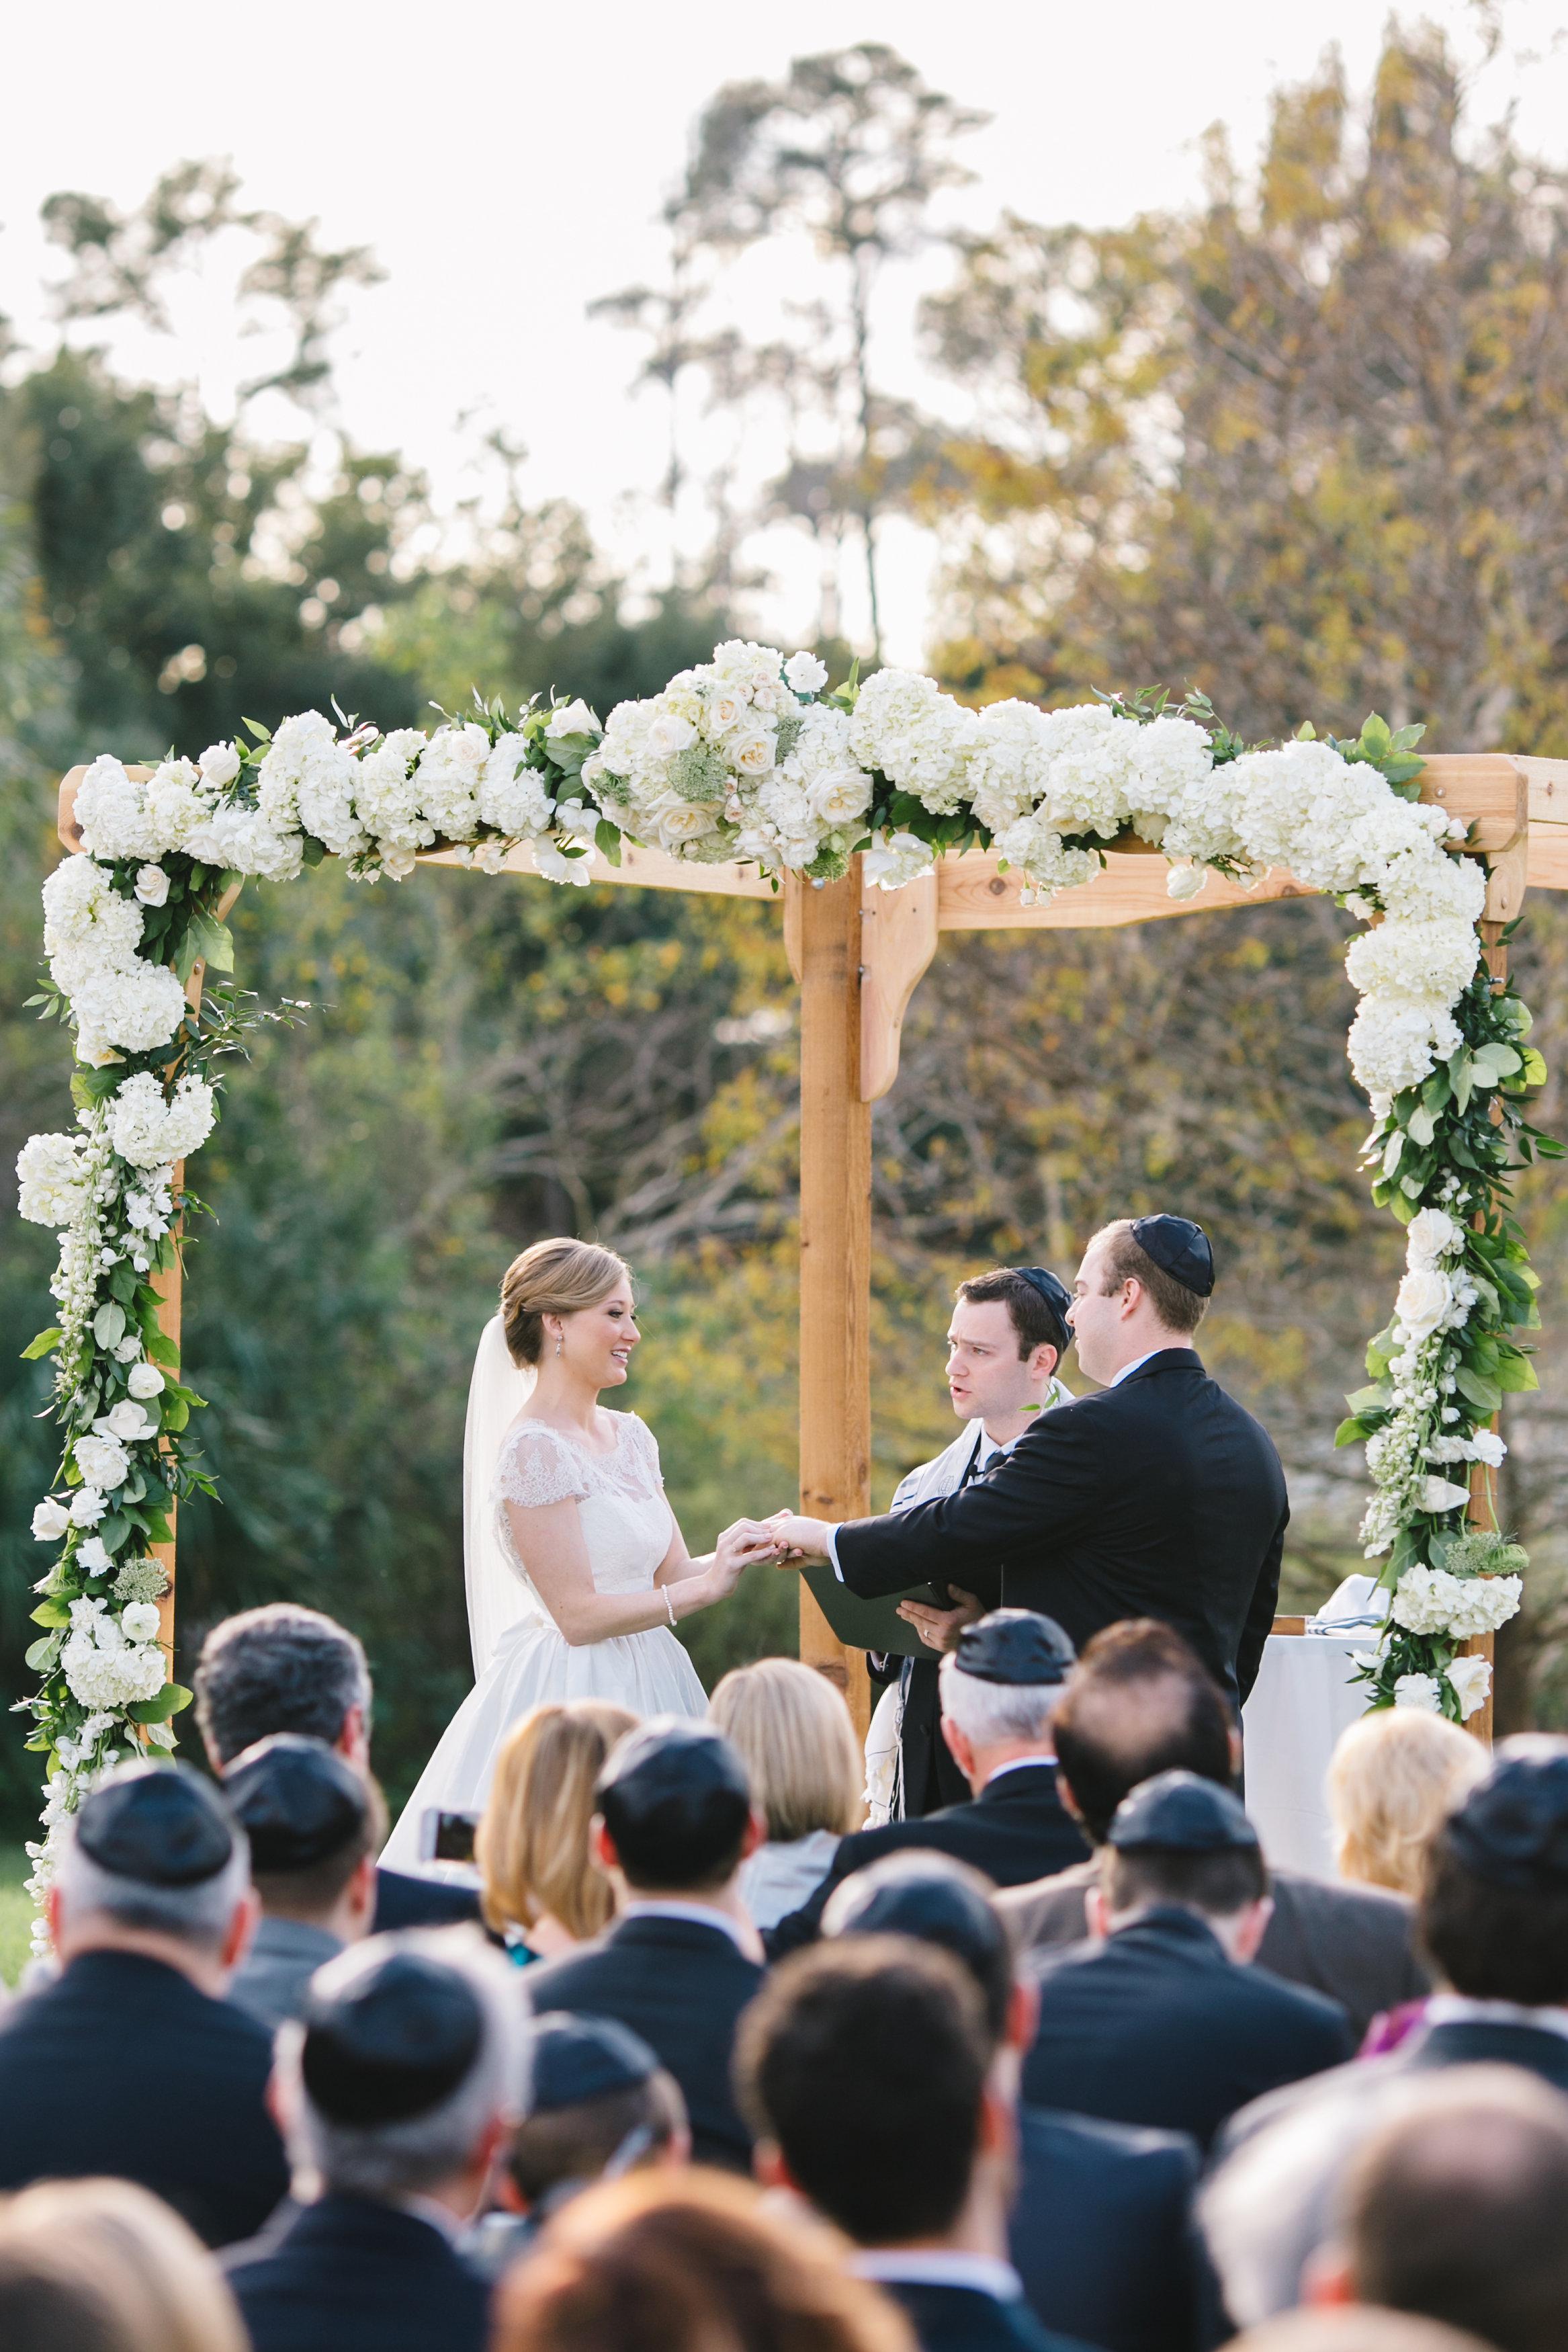 Traditional wedding ceremony huppah